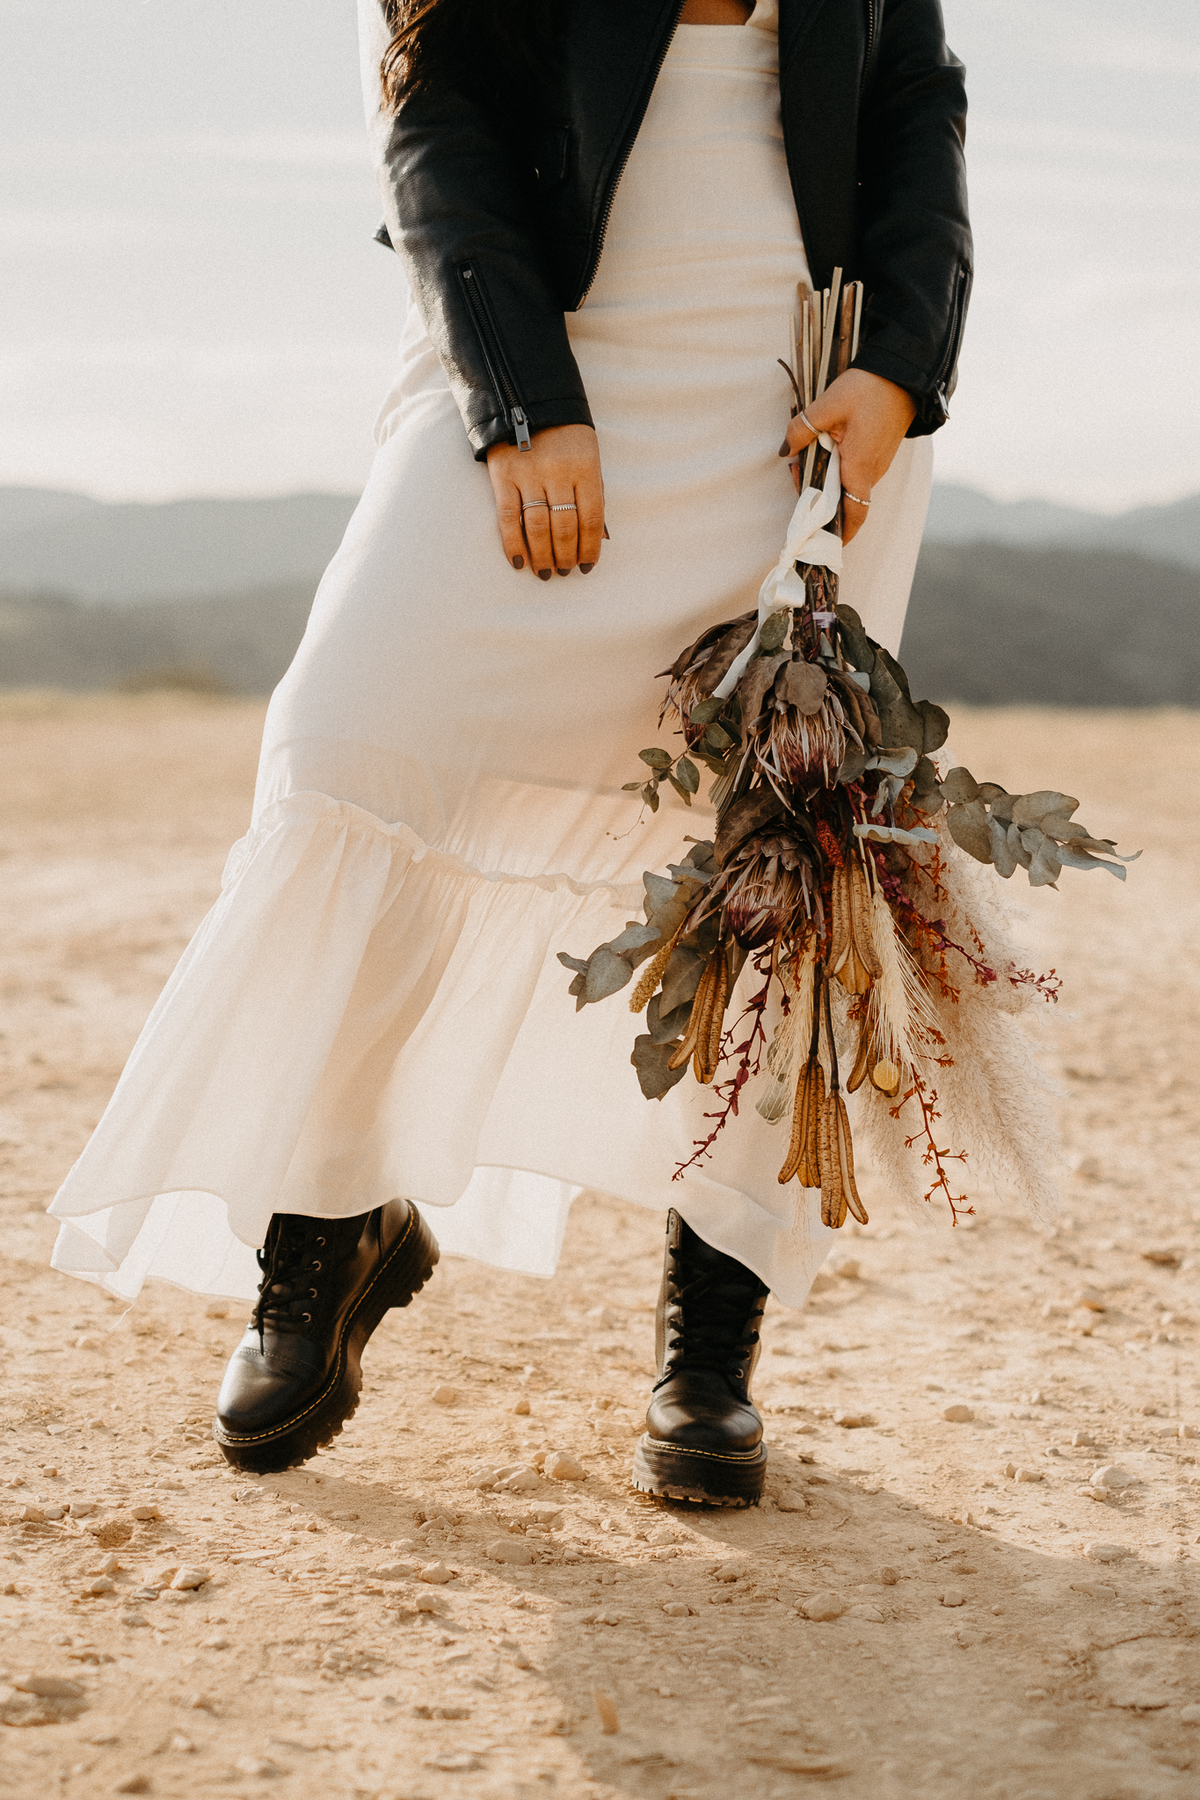 vestido de noiva buque desconstruido casamentos no campo cerimonia intimista fotografos autenticos